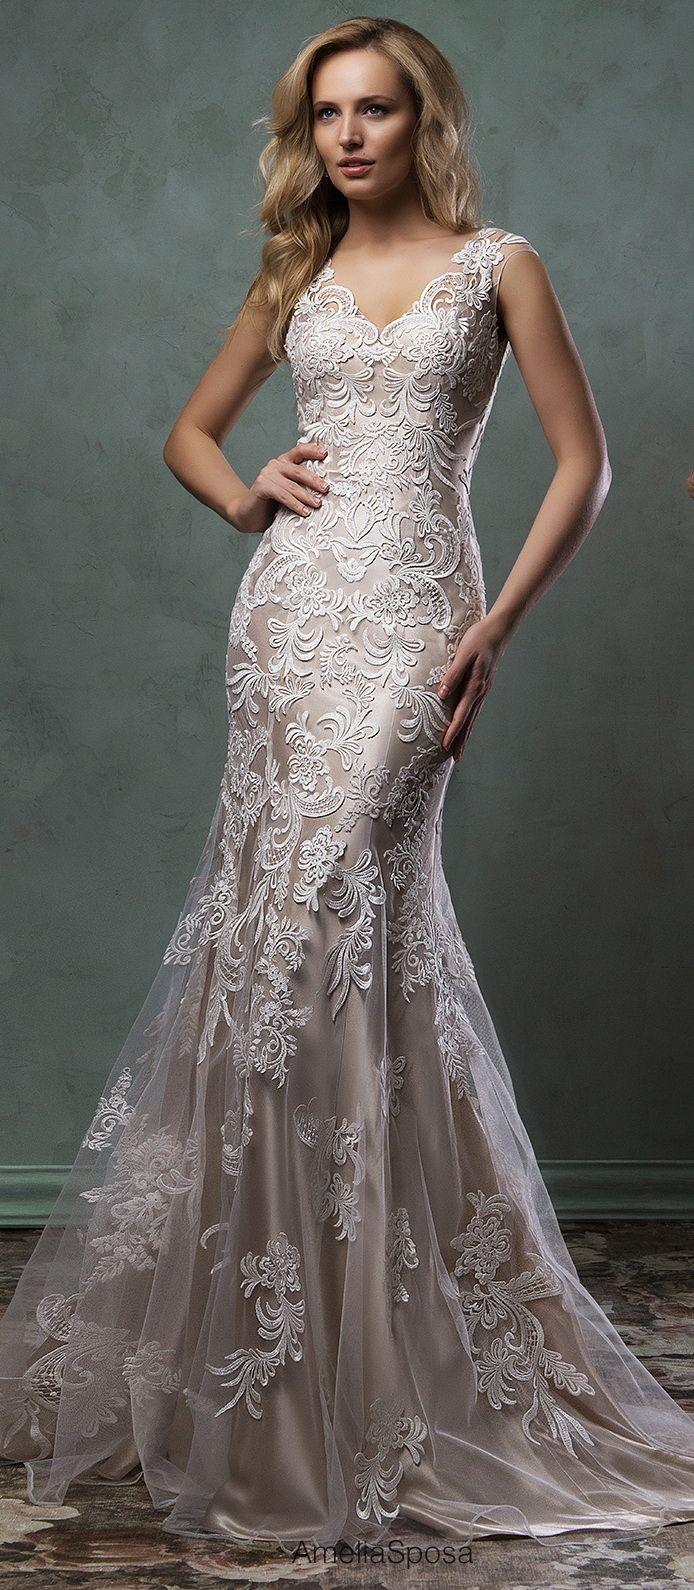 Amelia Sposa Lace Wedding With Champagne Underlay Amelia